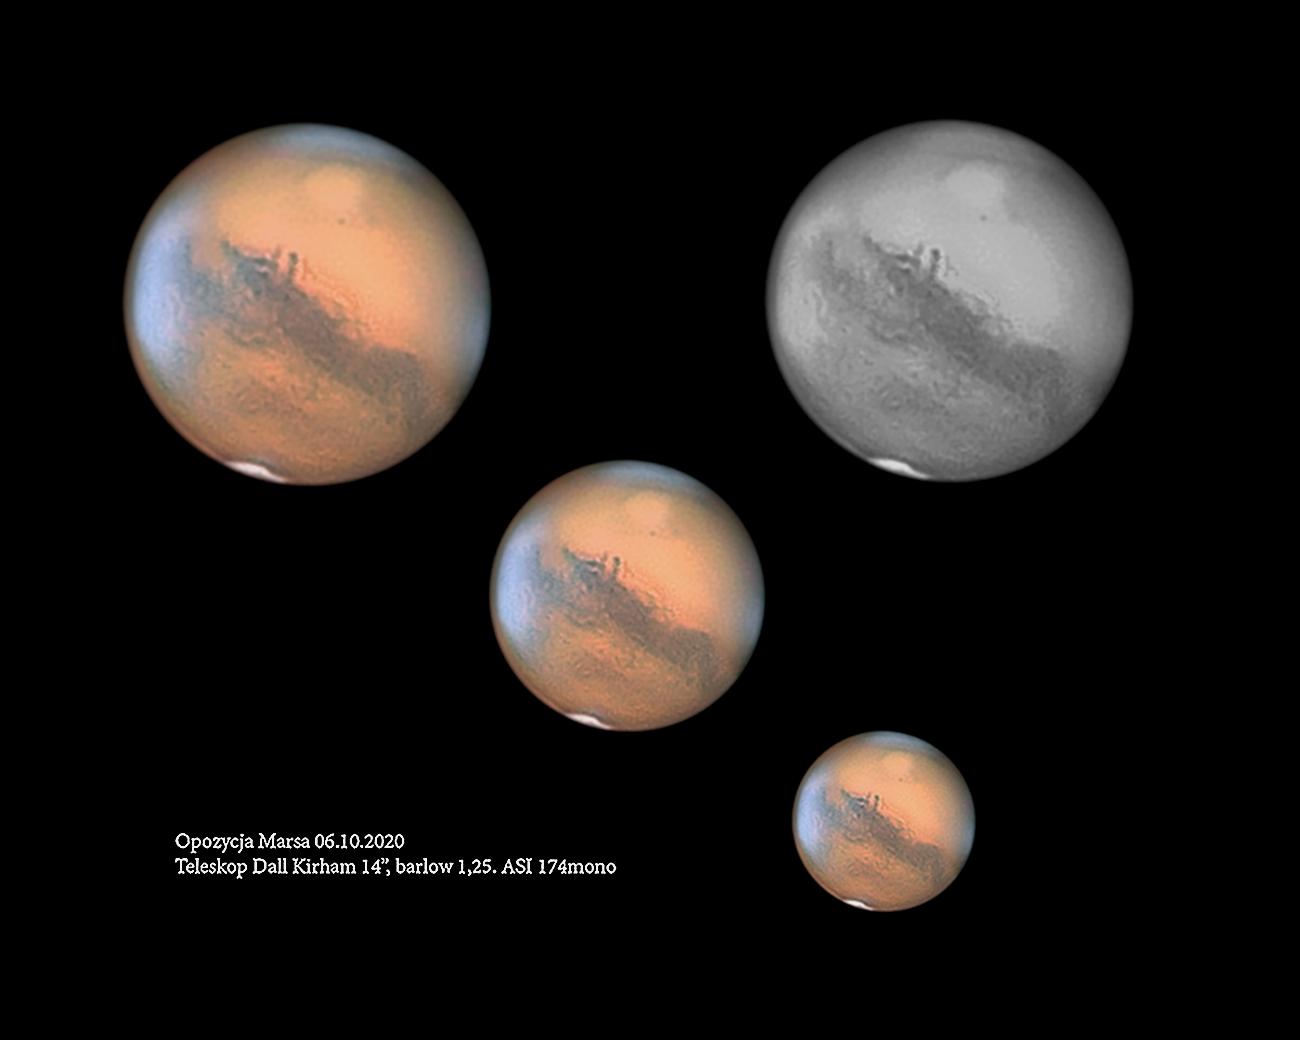 MARS_06102020_OPOZYCJA.png